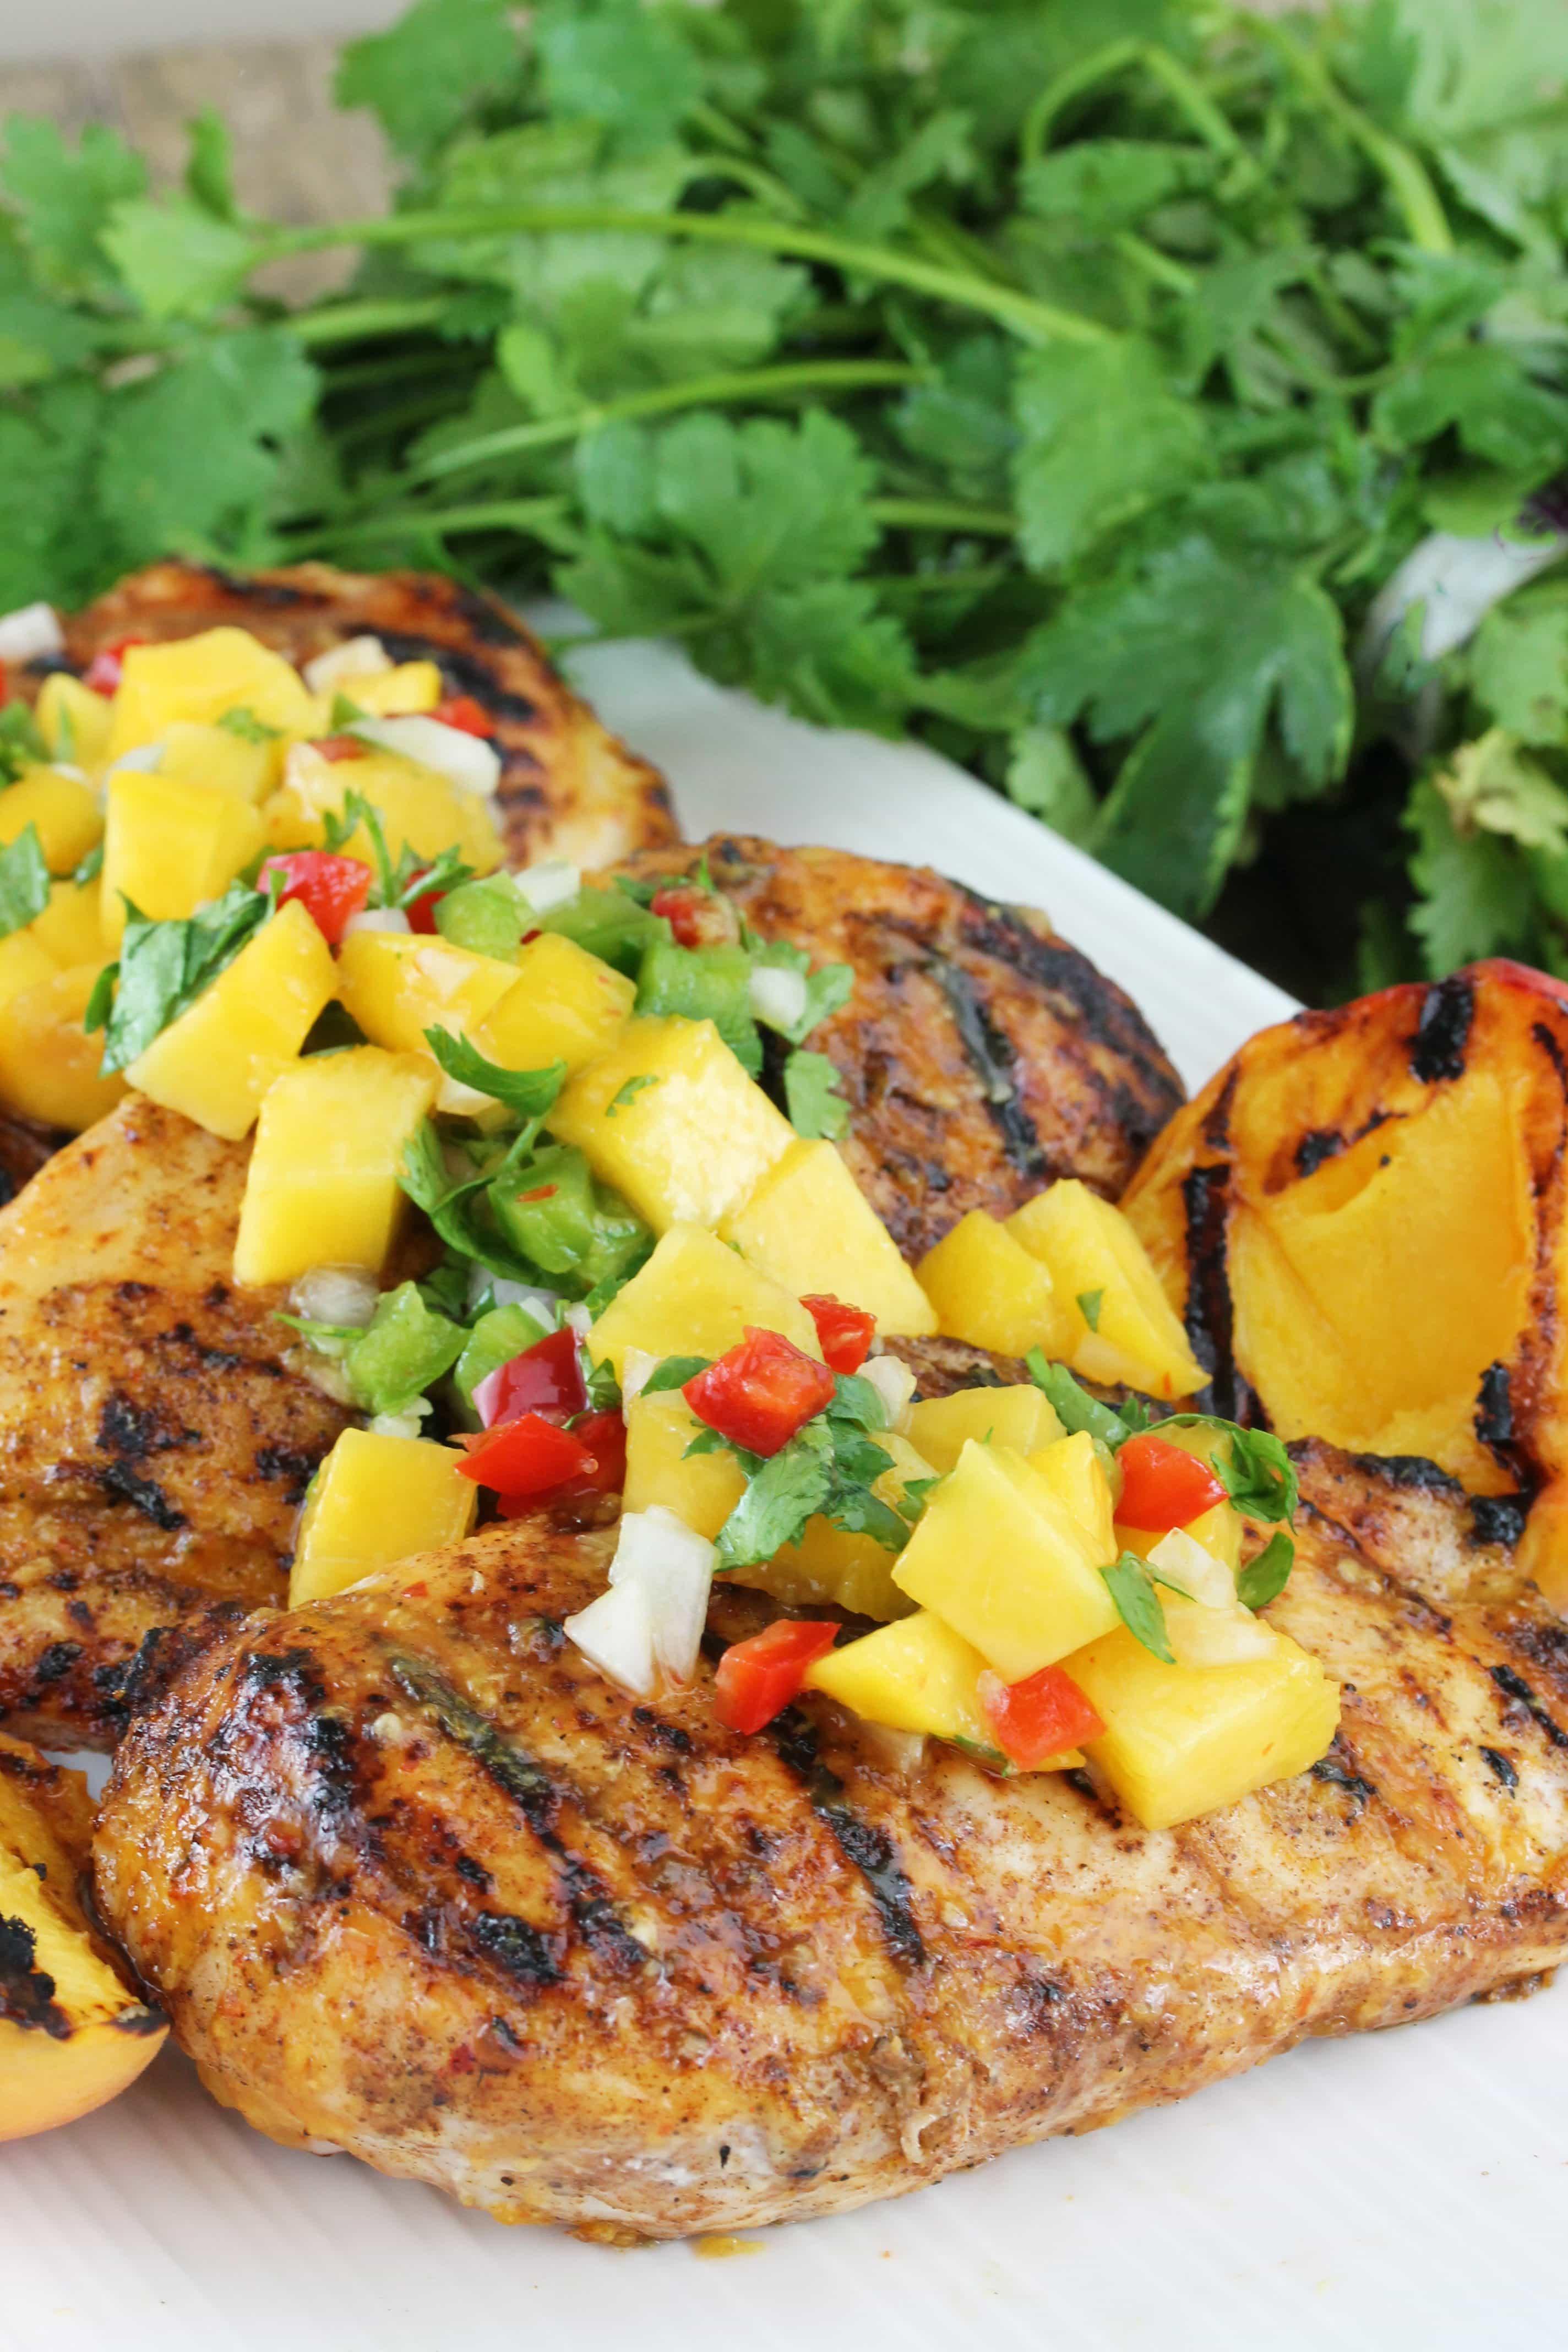 Chipotle-Peach Glazed Grilled Chicken Breast